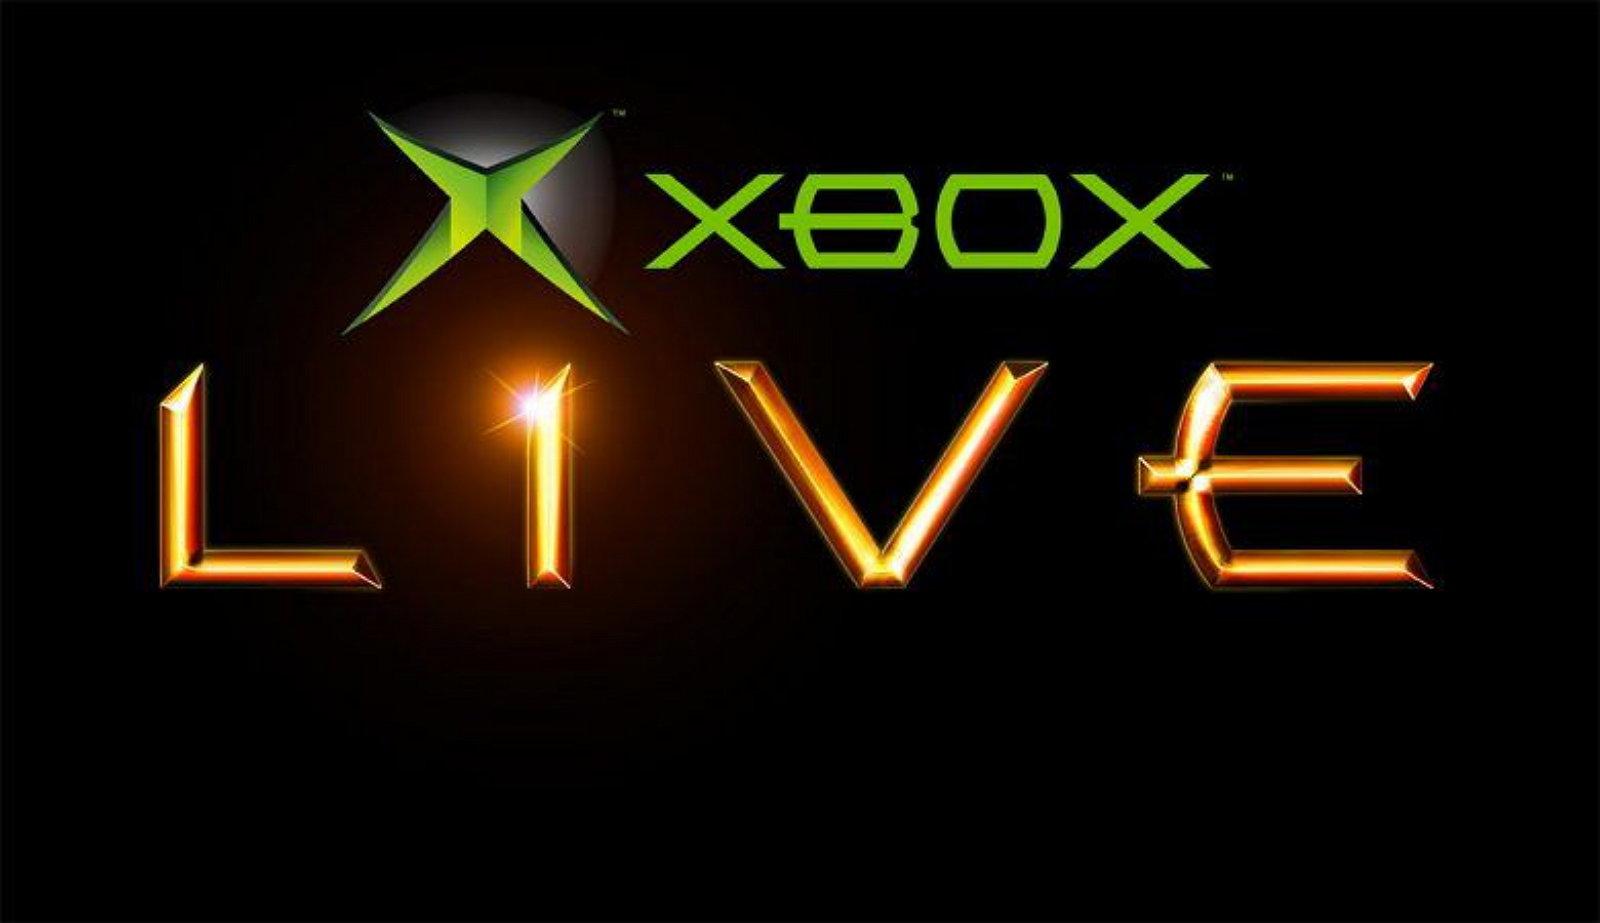 xbox live logo 2017 - photo #17